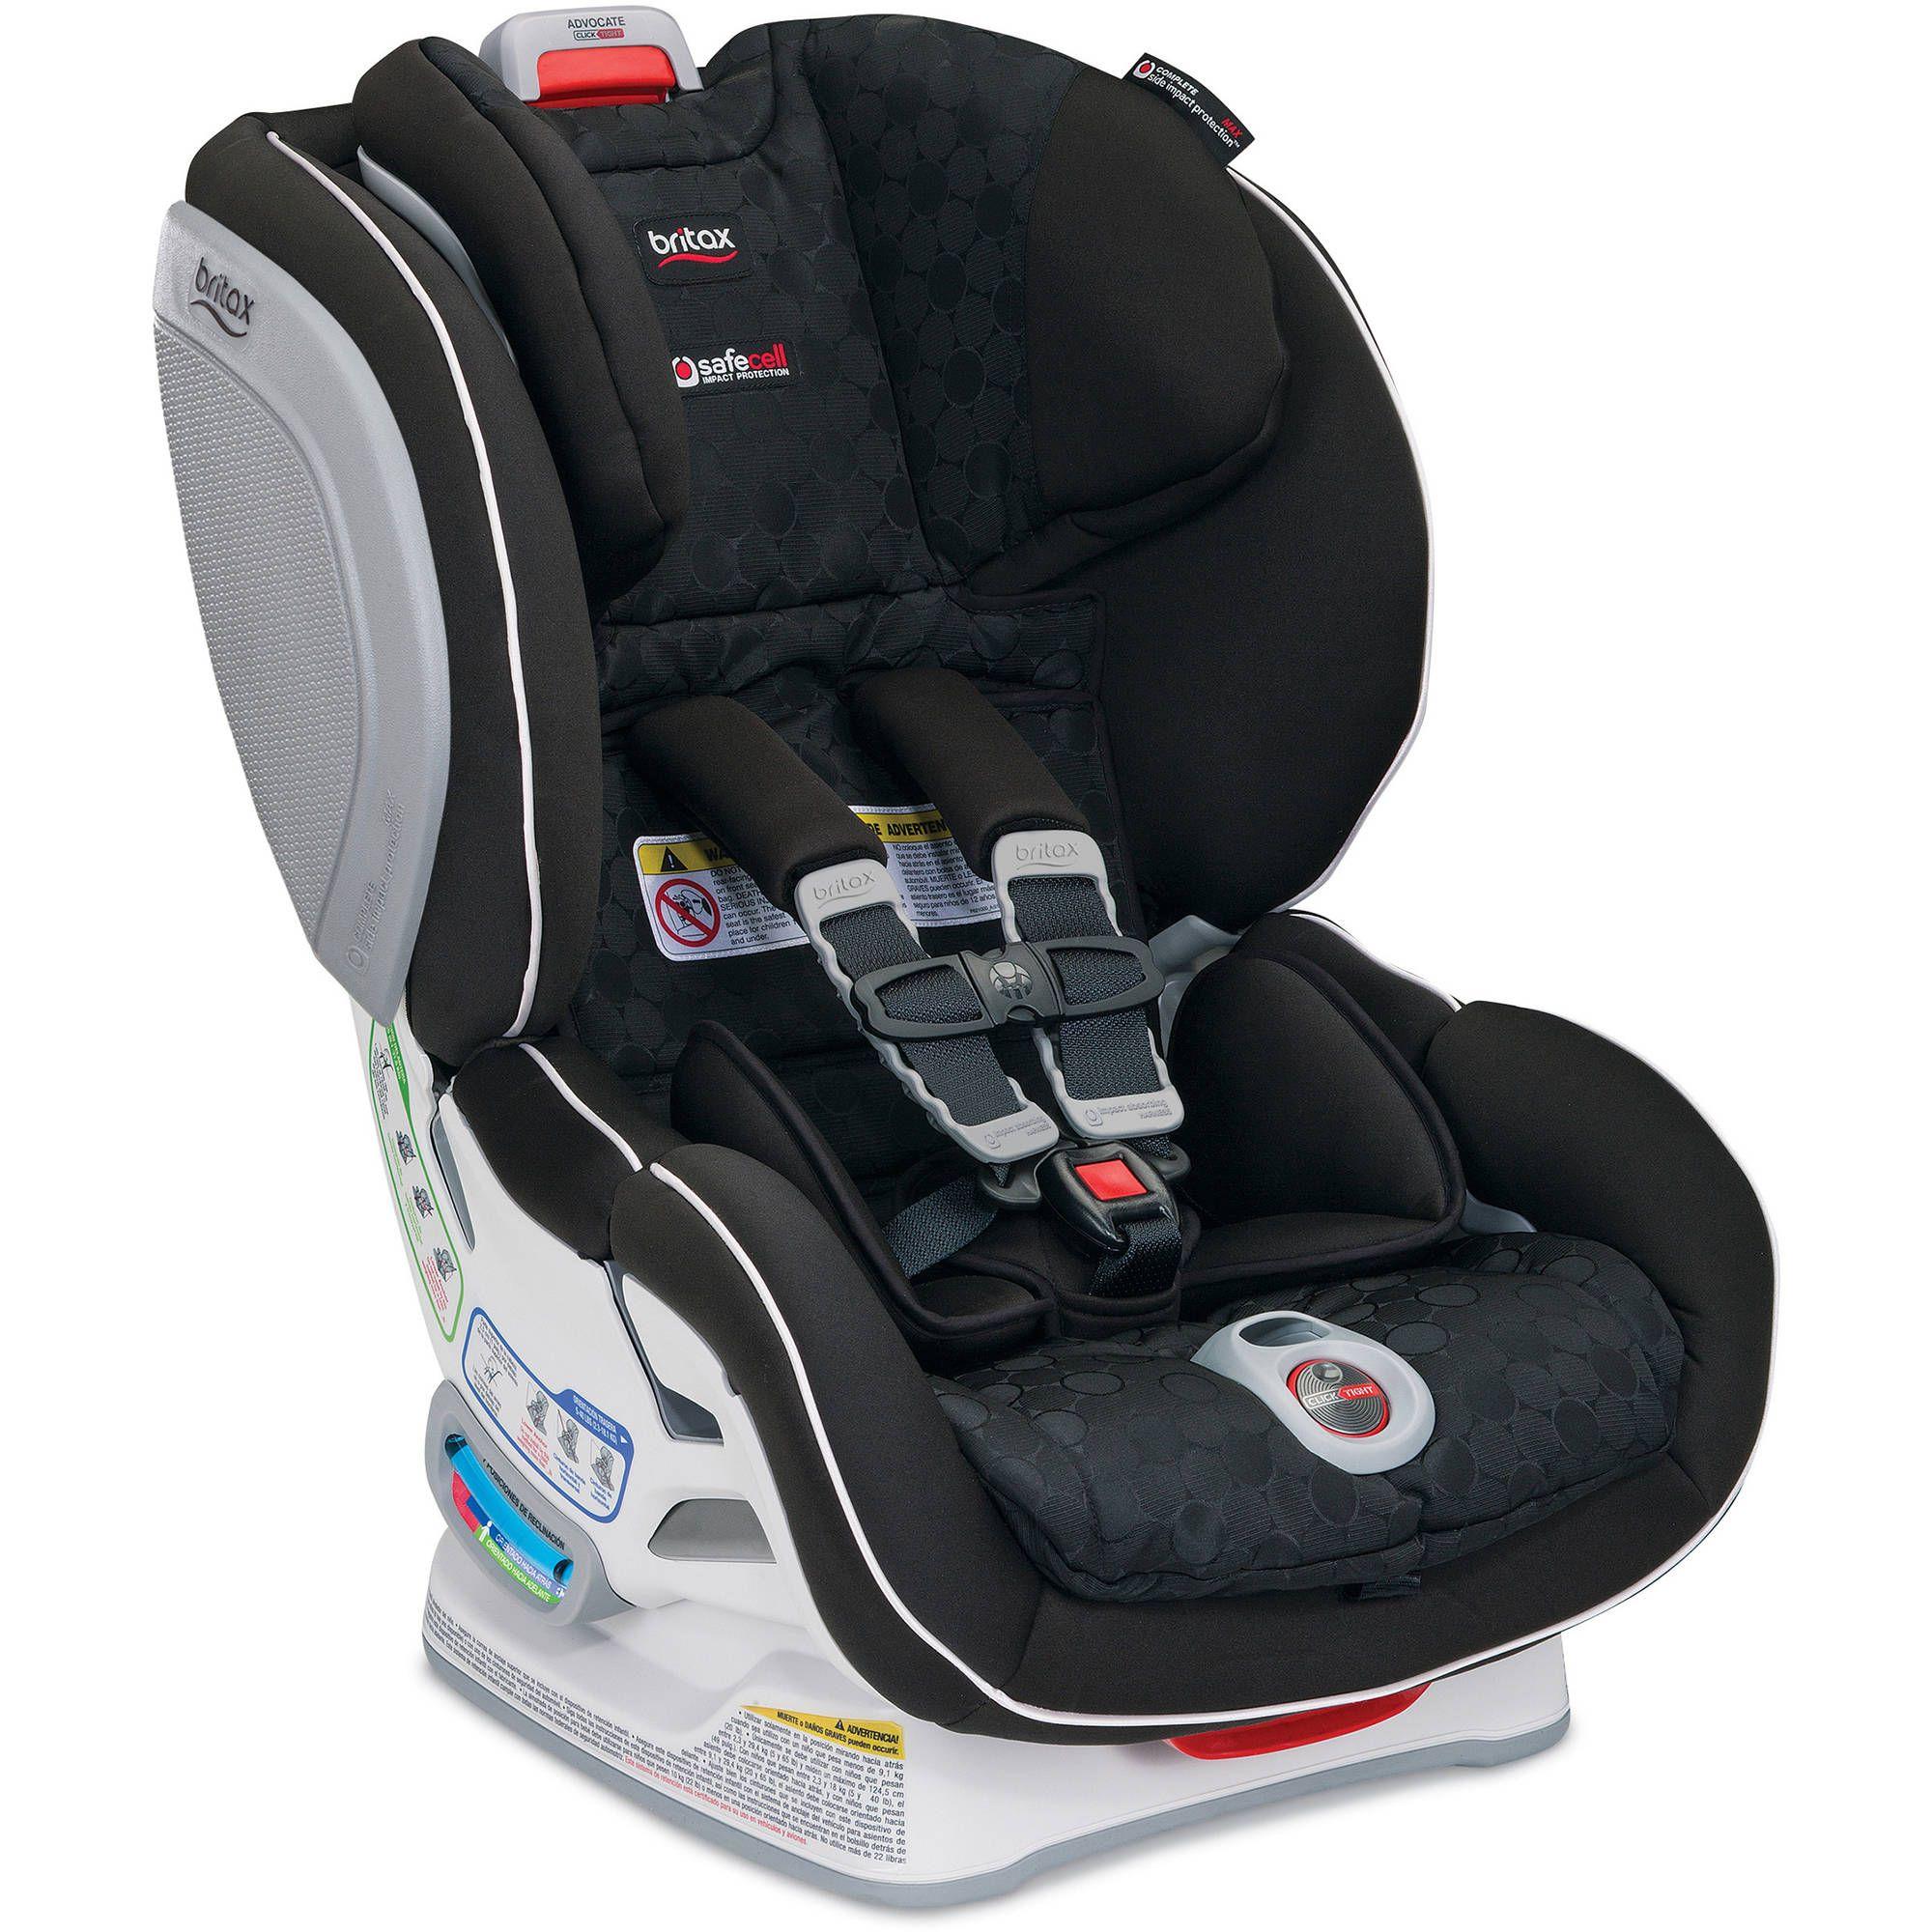 Britax Advocate ClickTight Convertible Car Seat, Choose